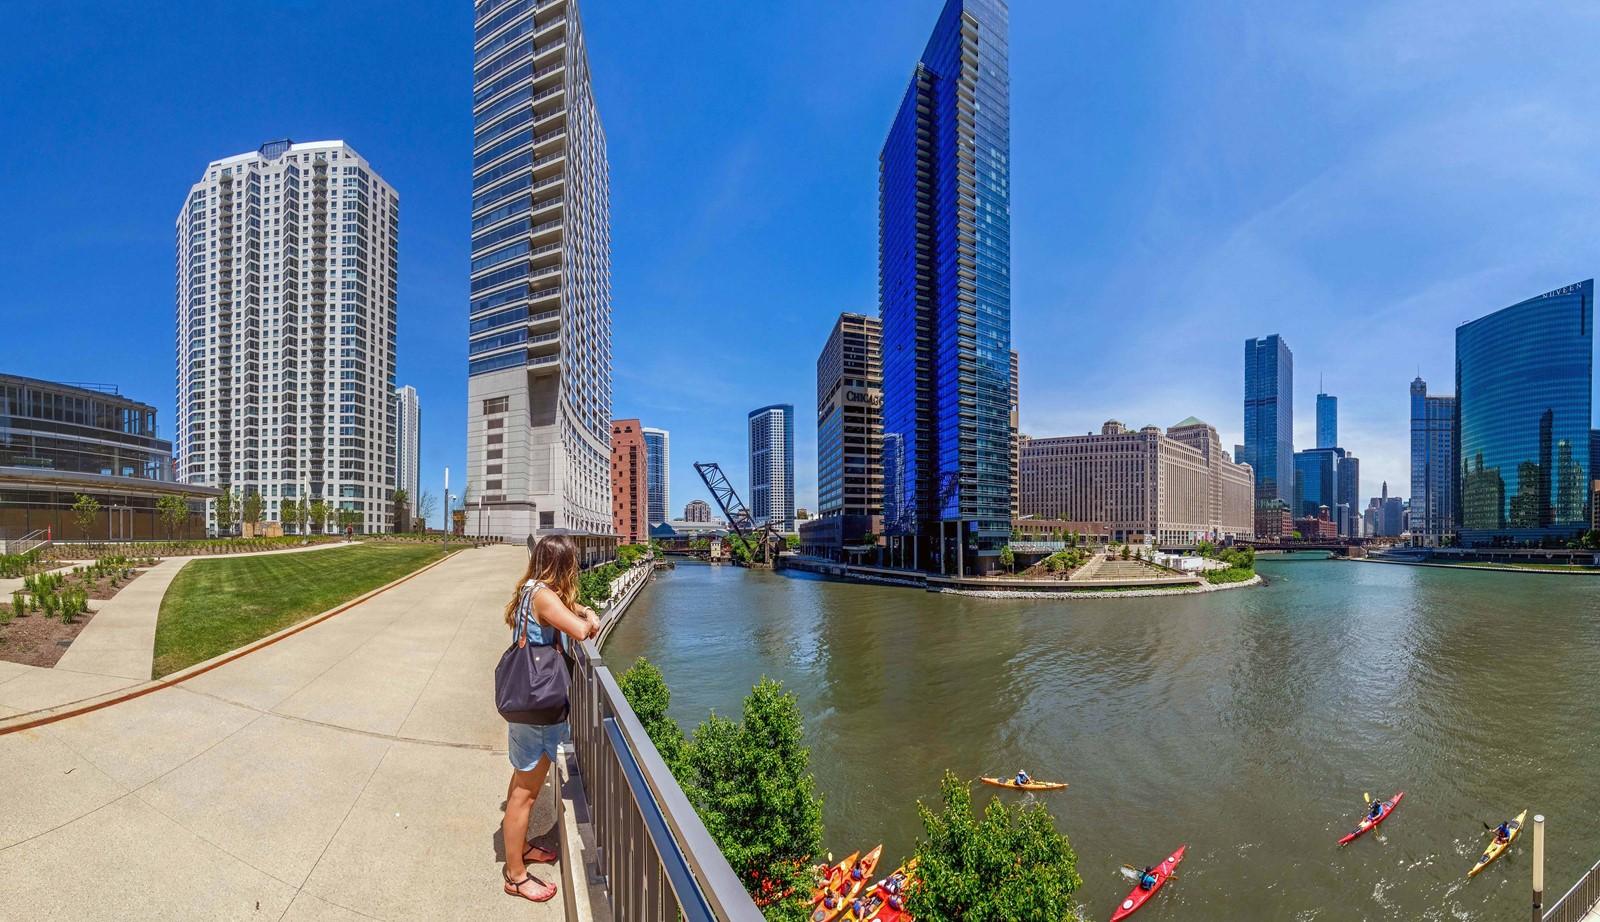 Left Bank River Point Park Chicago